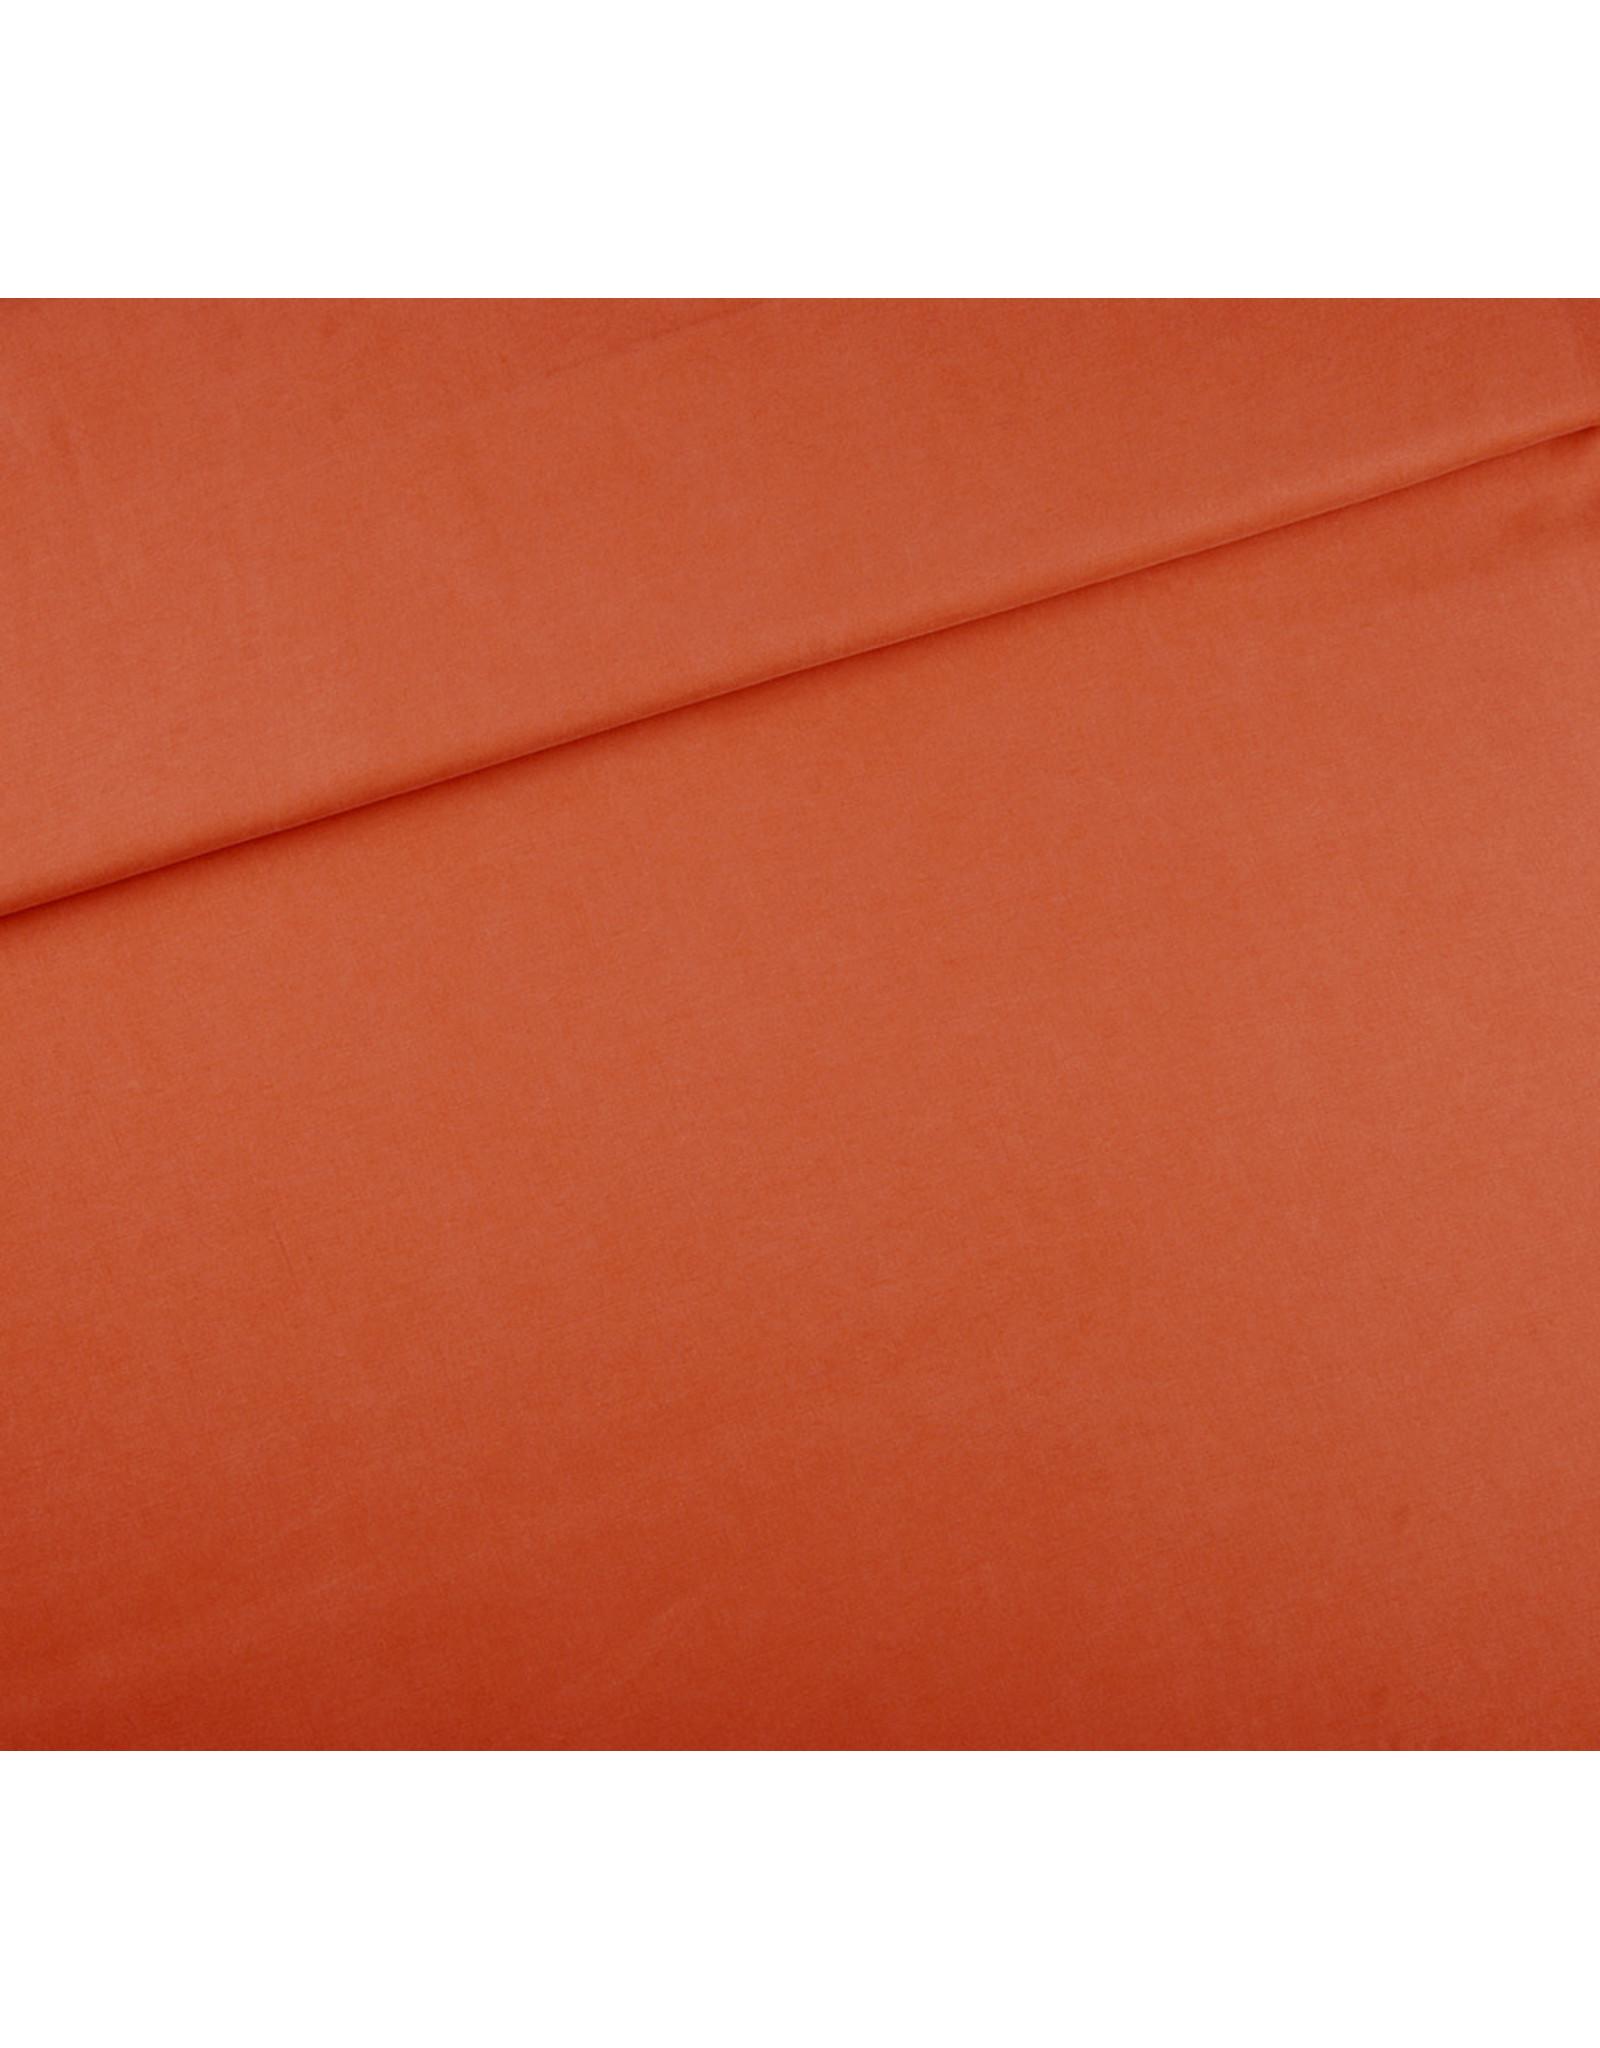 Editex Lycocell oranje/ roest